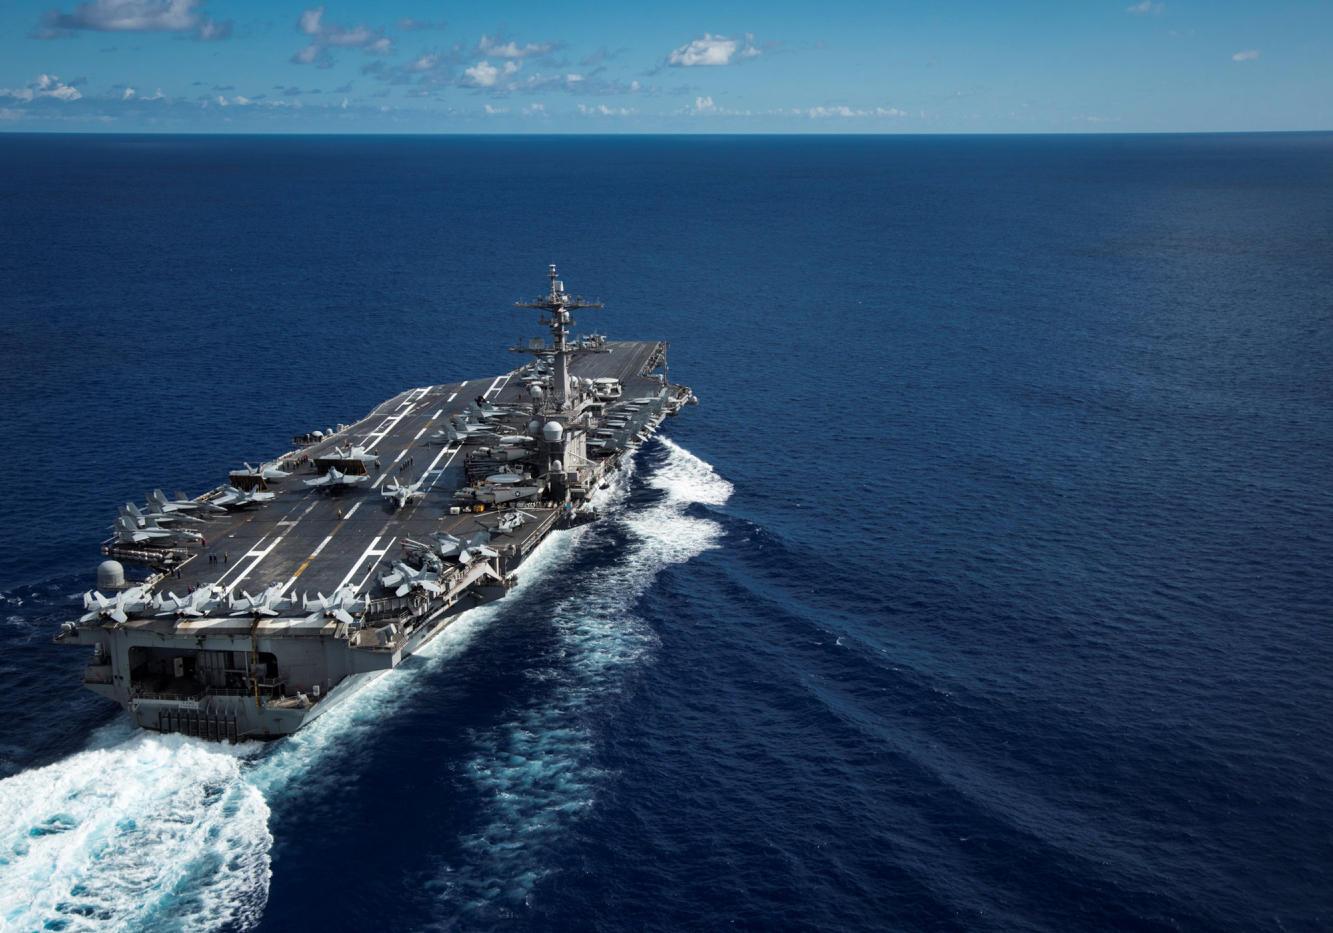 USS Carl Vinson aircraft carrier (Photo: Reuters)